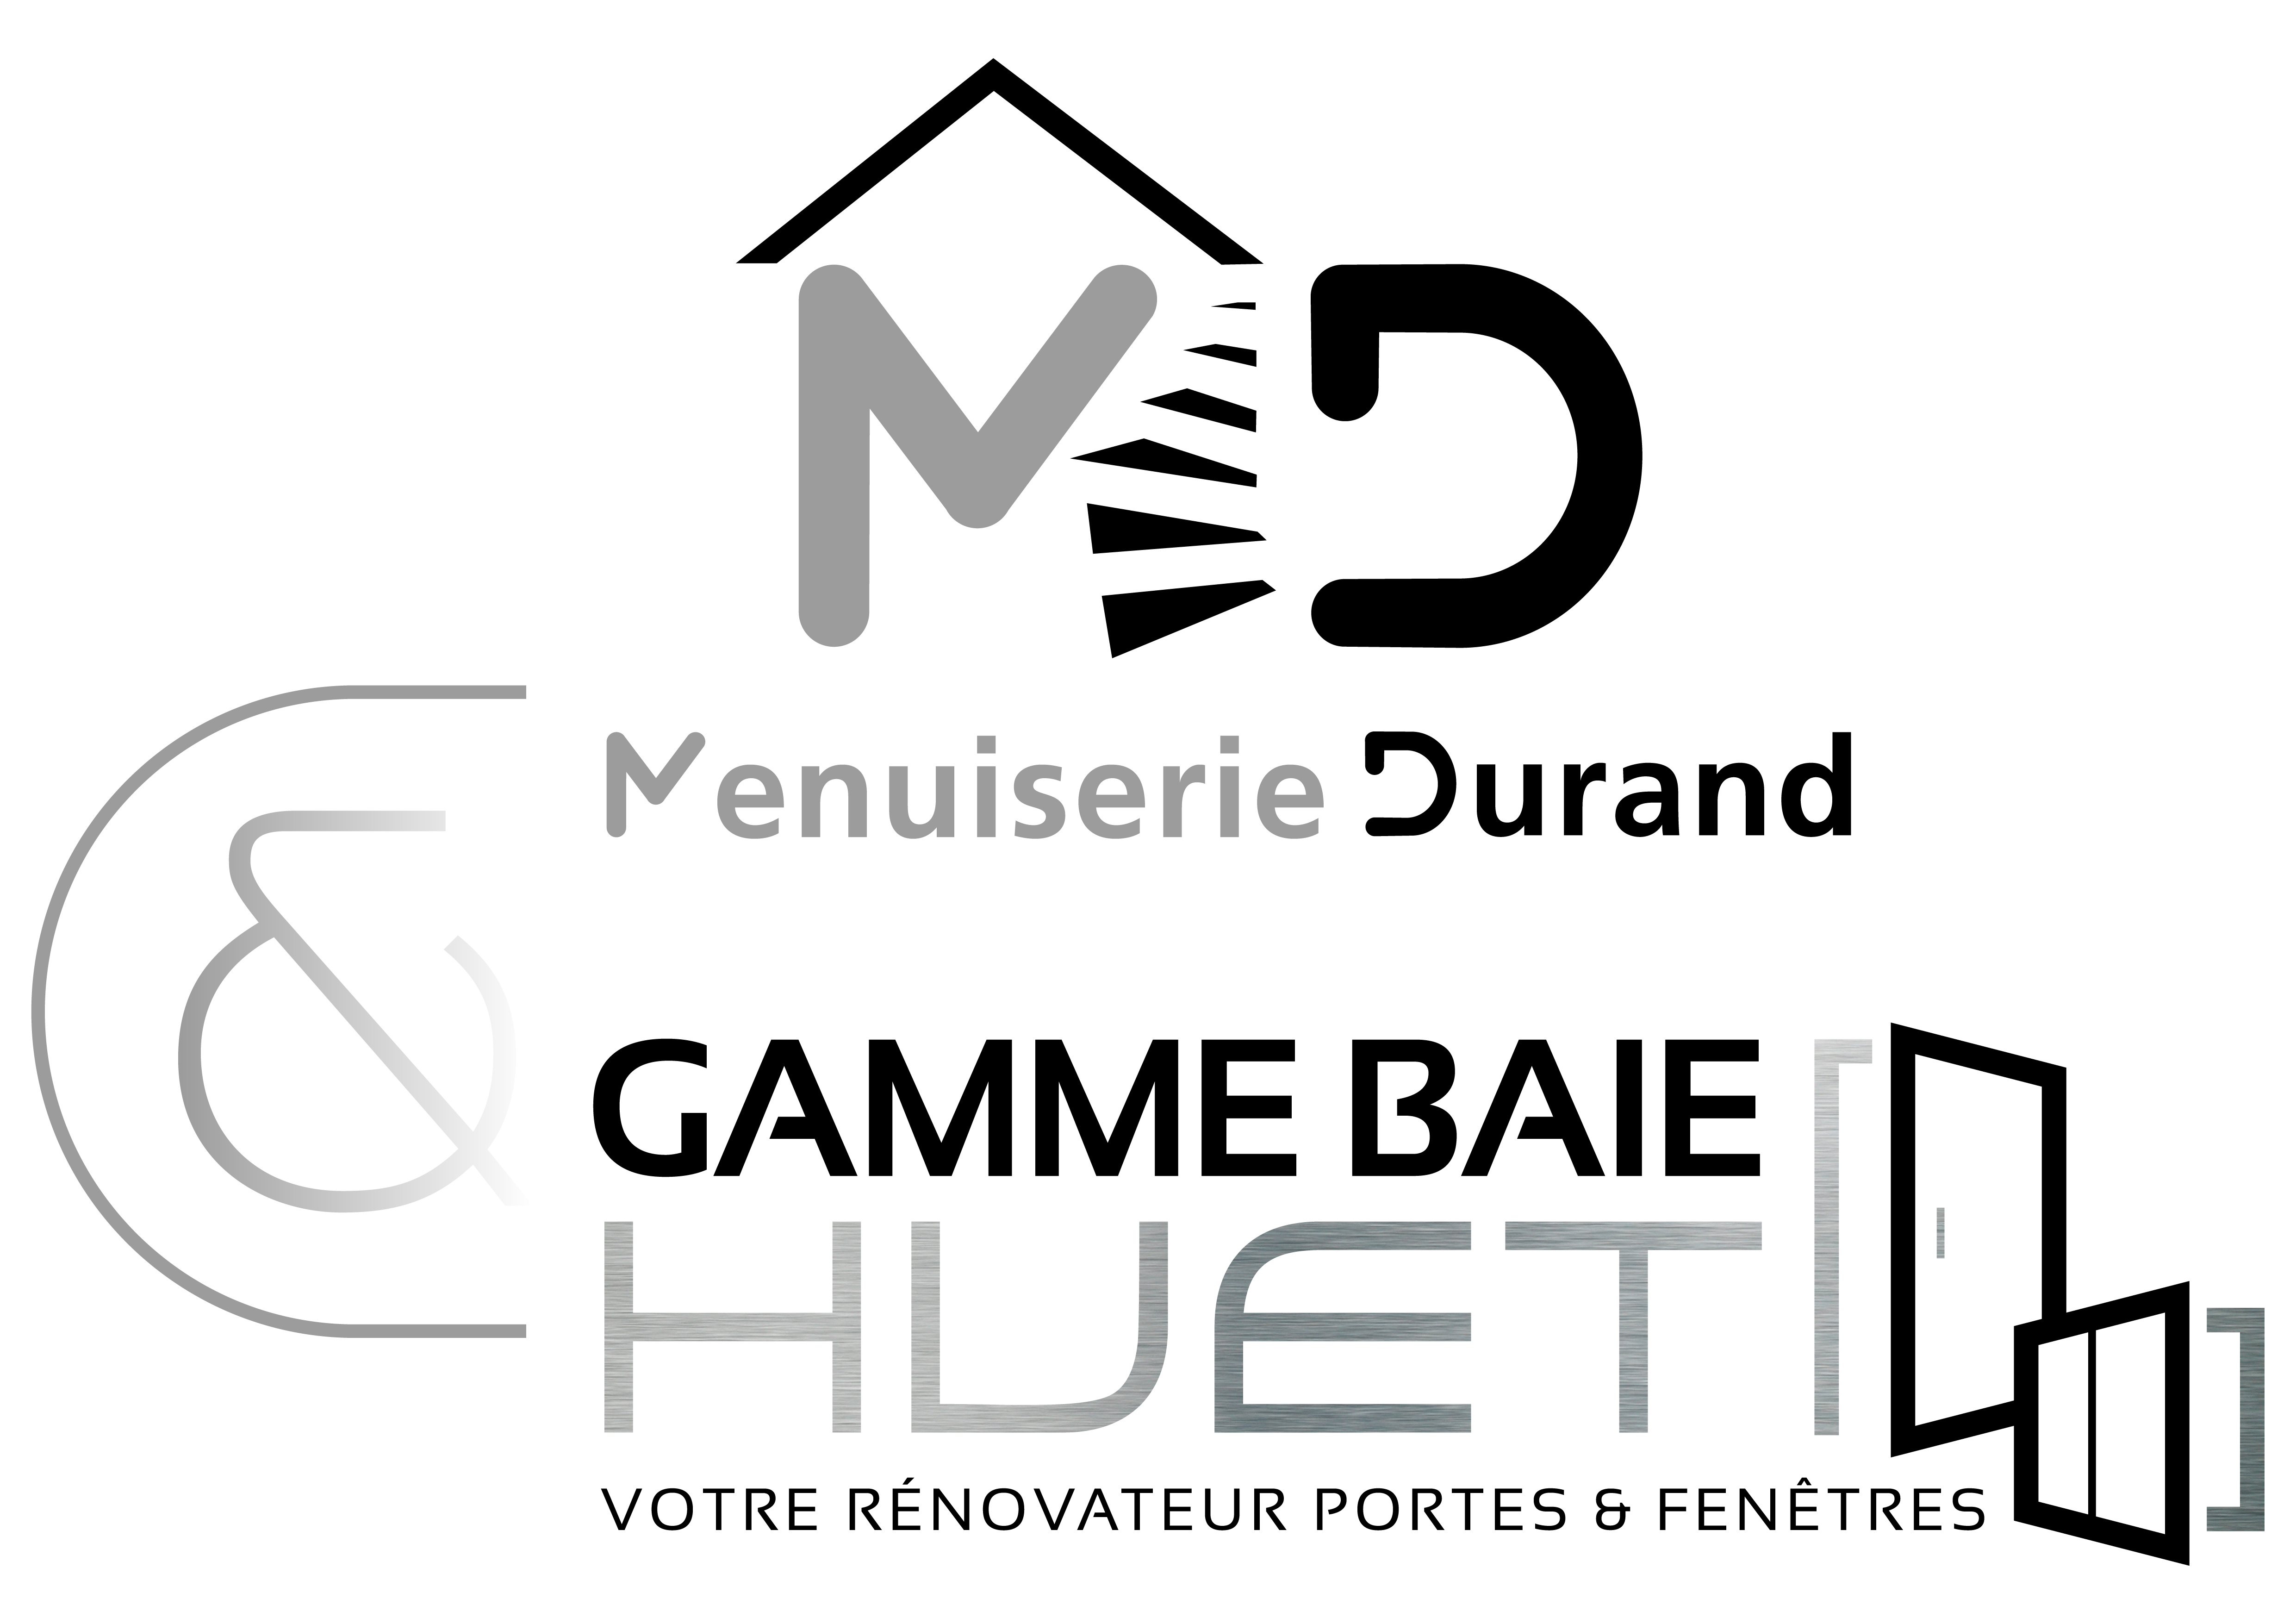 Logo_GBH_Durand_Menuiserie 2021_Fond blanc carré